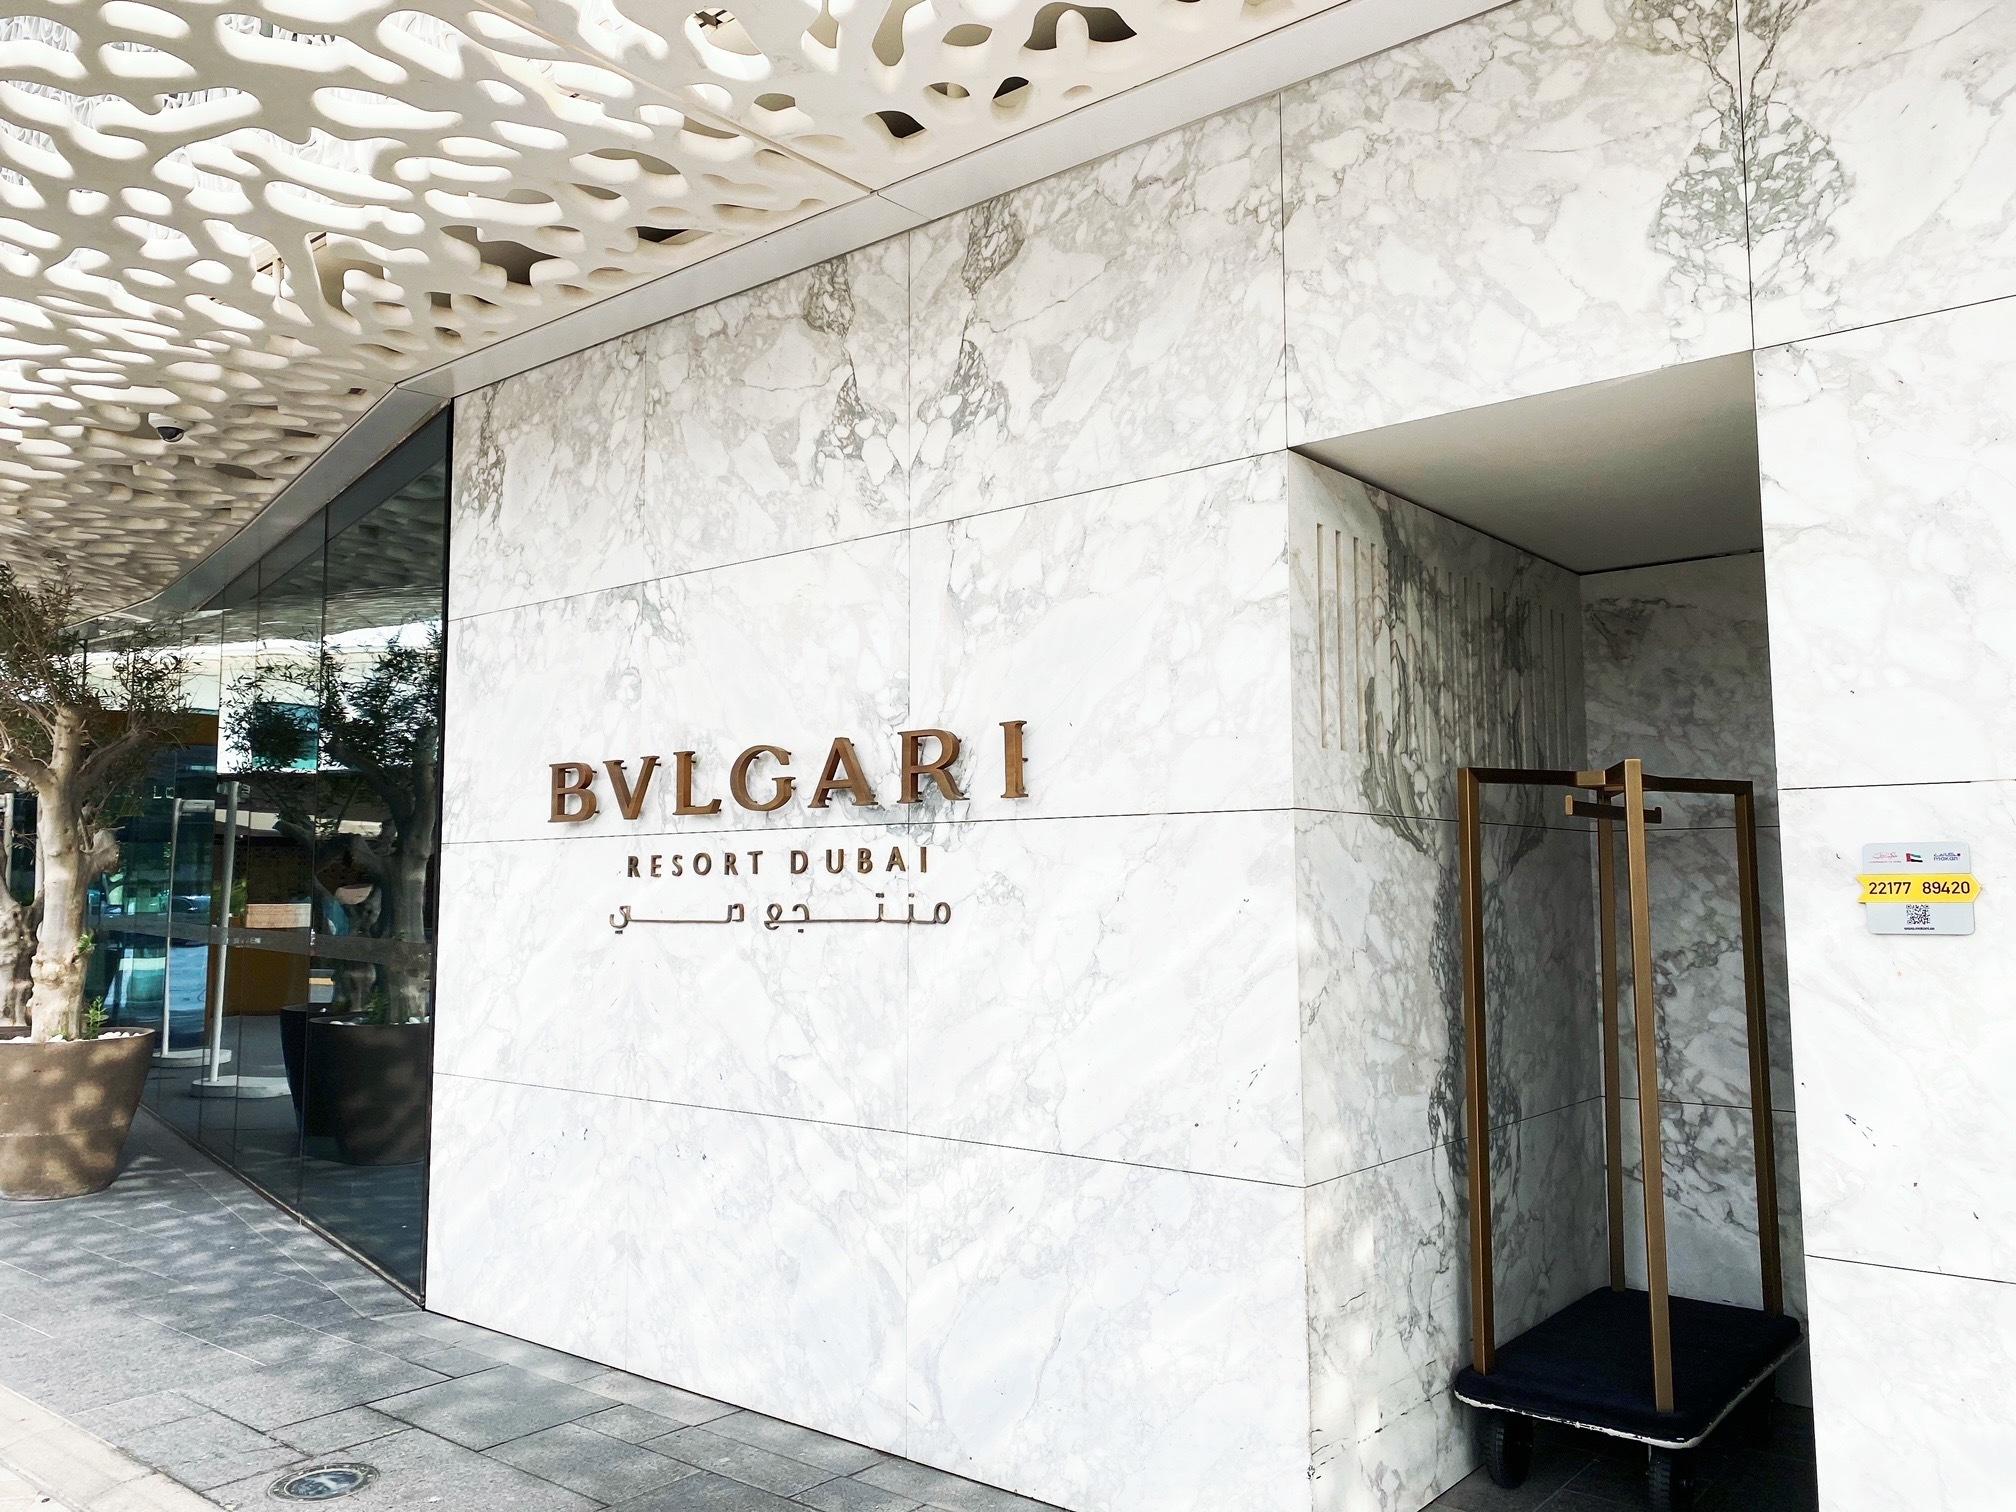 BVLGARI RESORT ディナーと夜景&朝食編〜ドバイ③〜_1_16